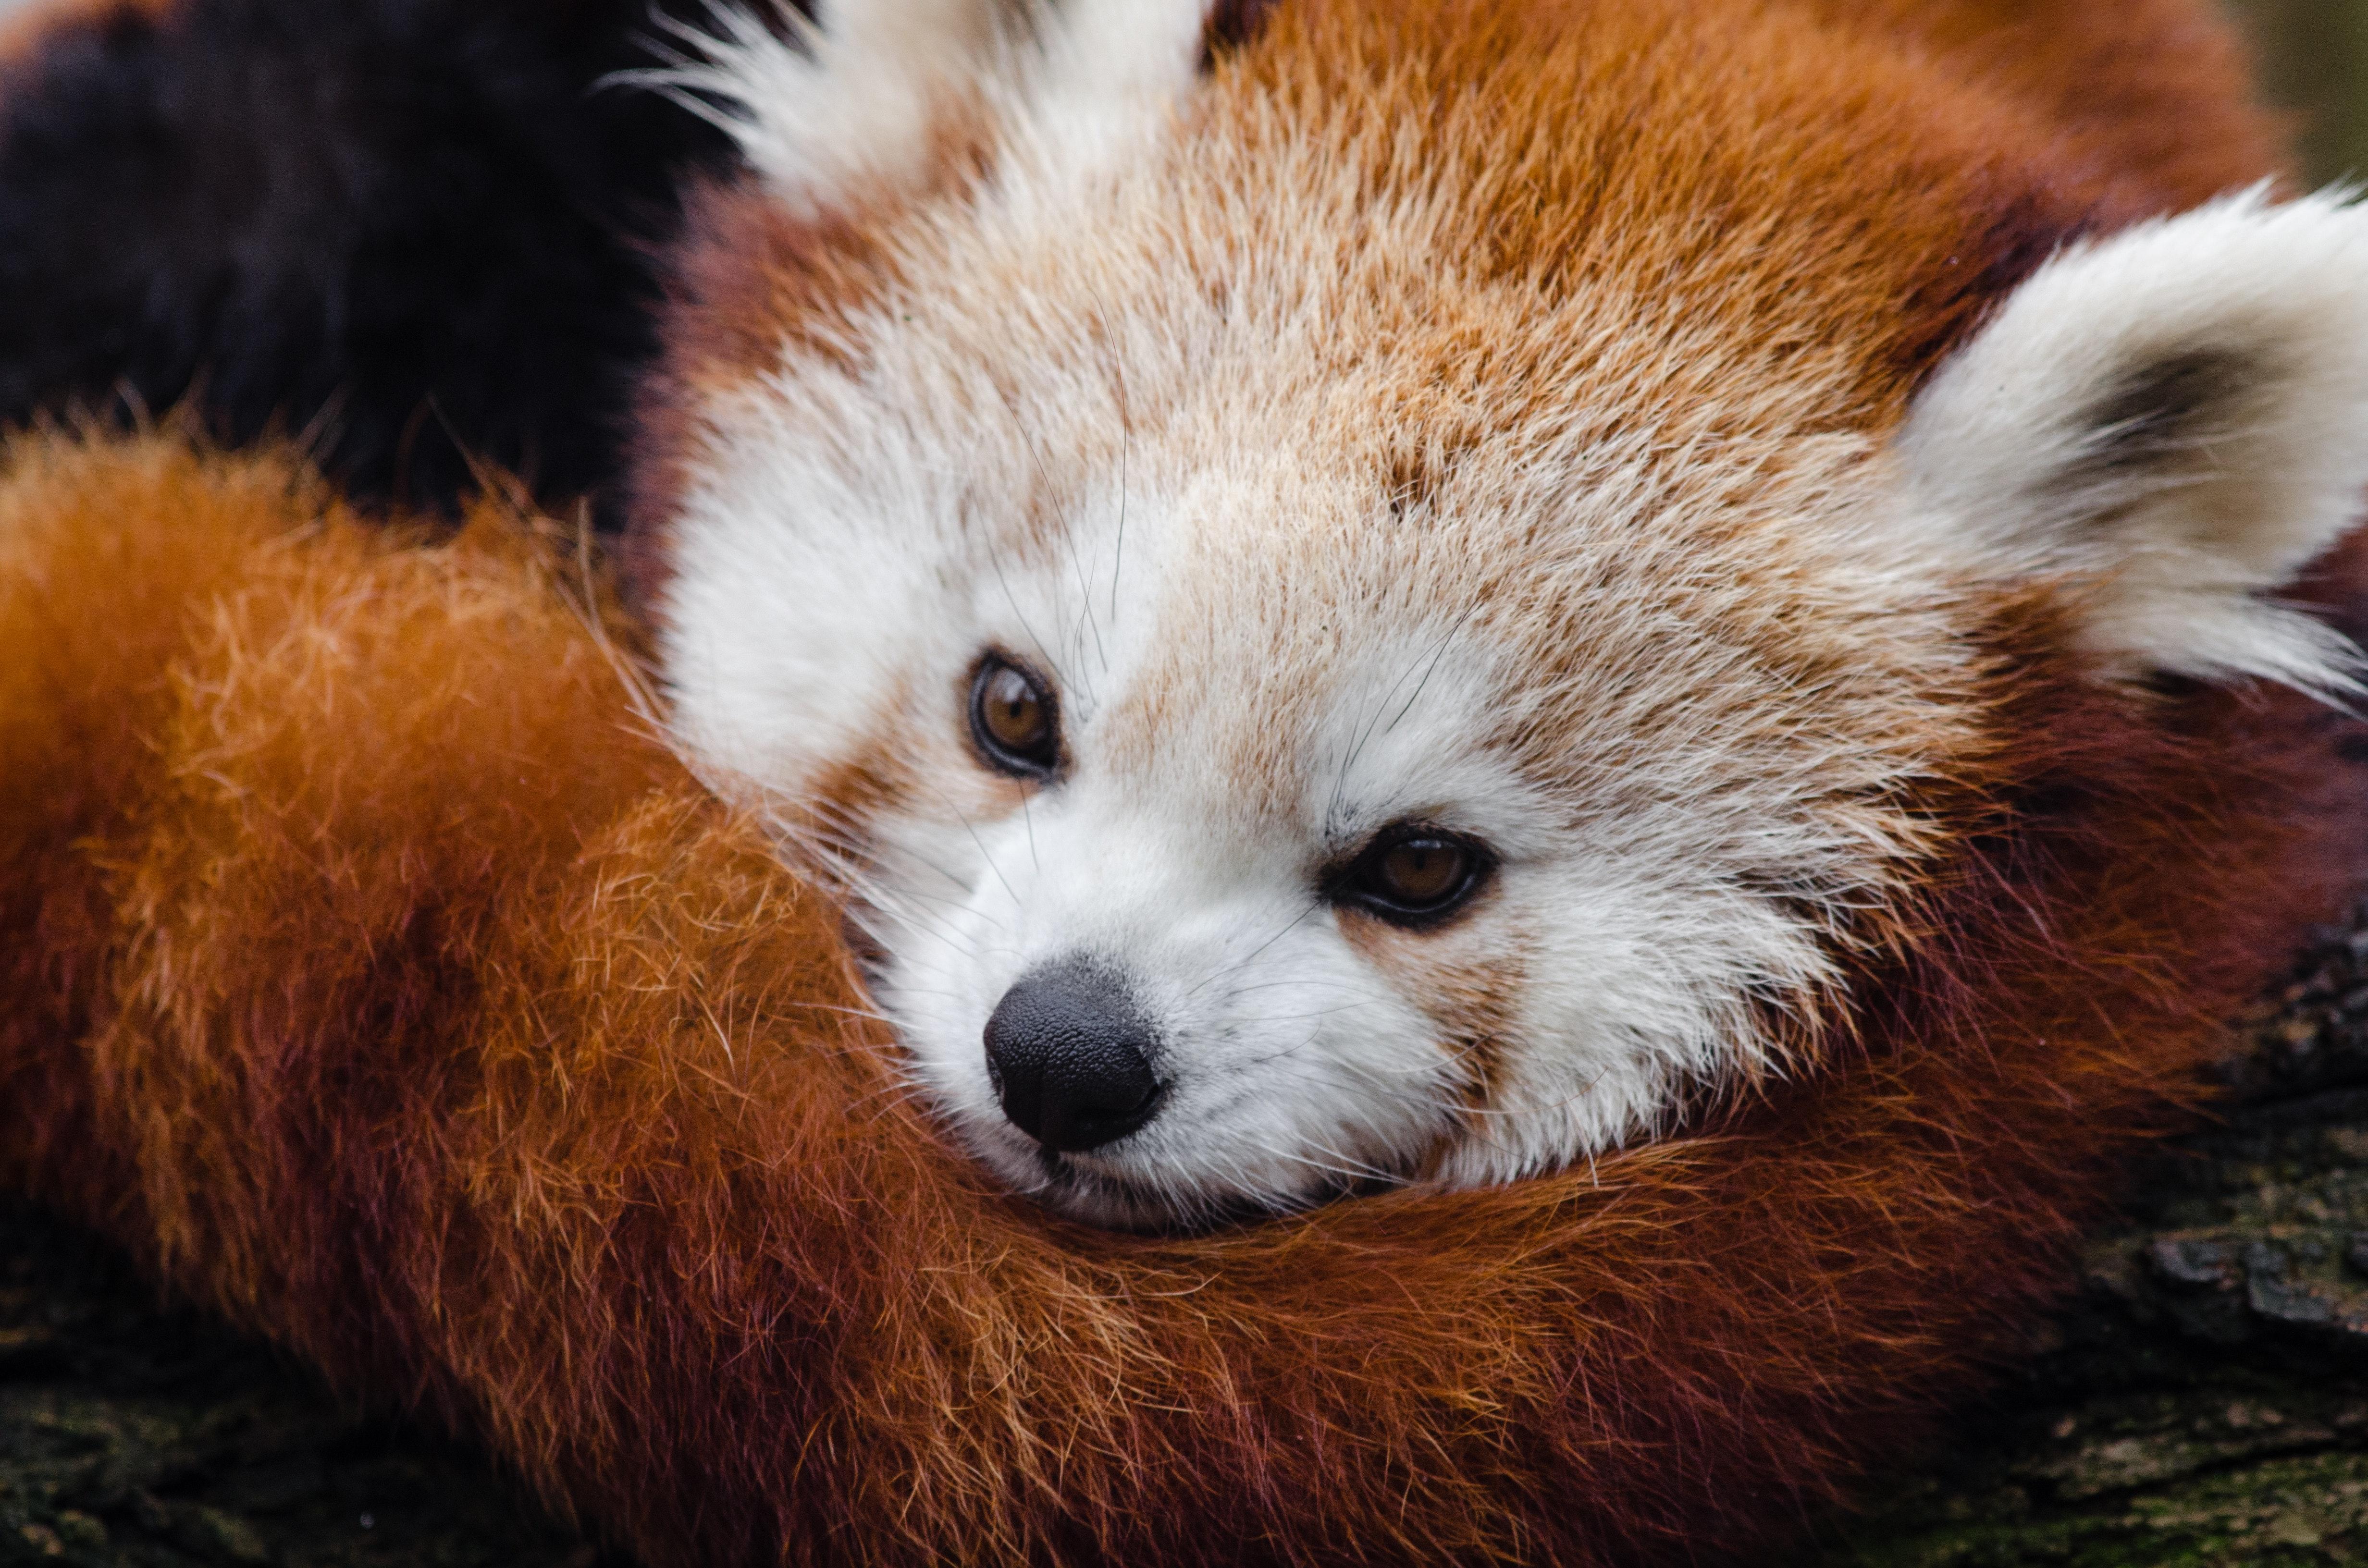 Red Panda Sleeping On Tree Branch 183 Free Stock Photo